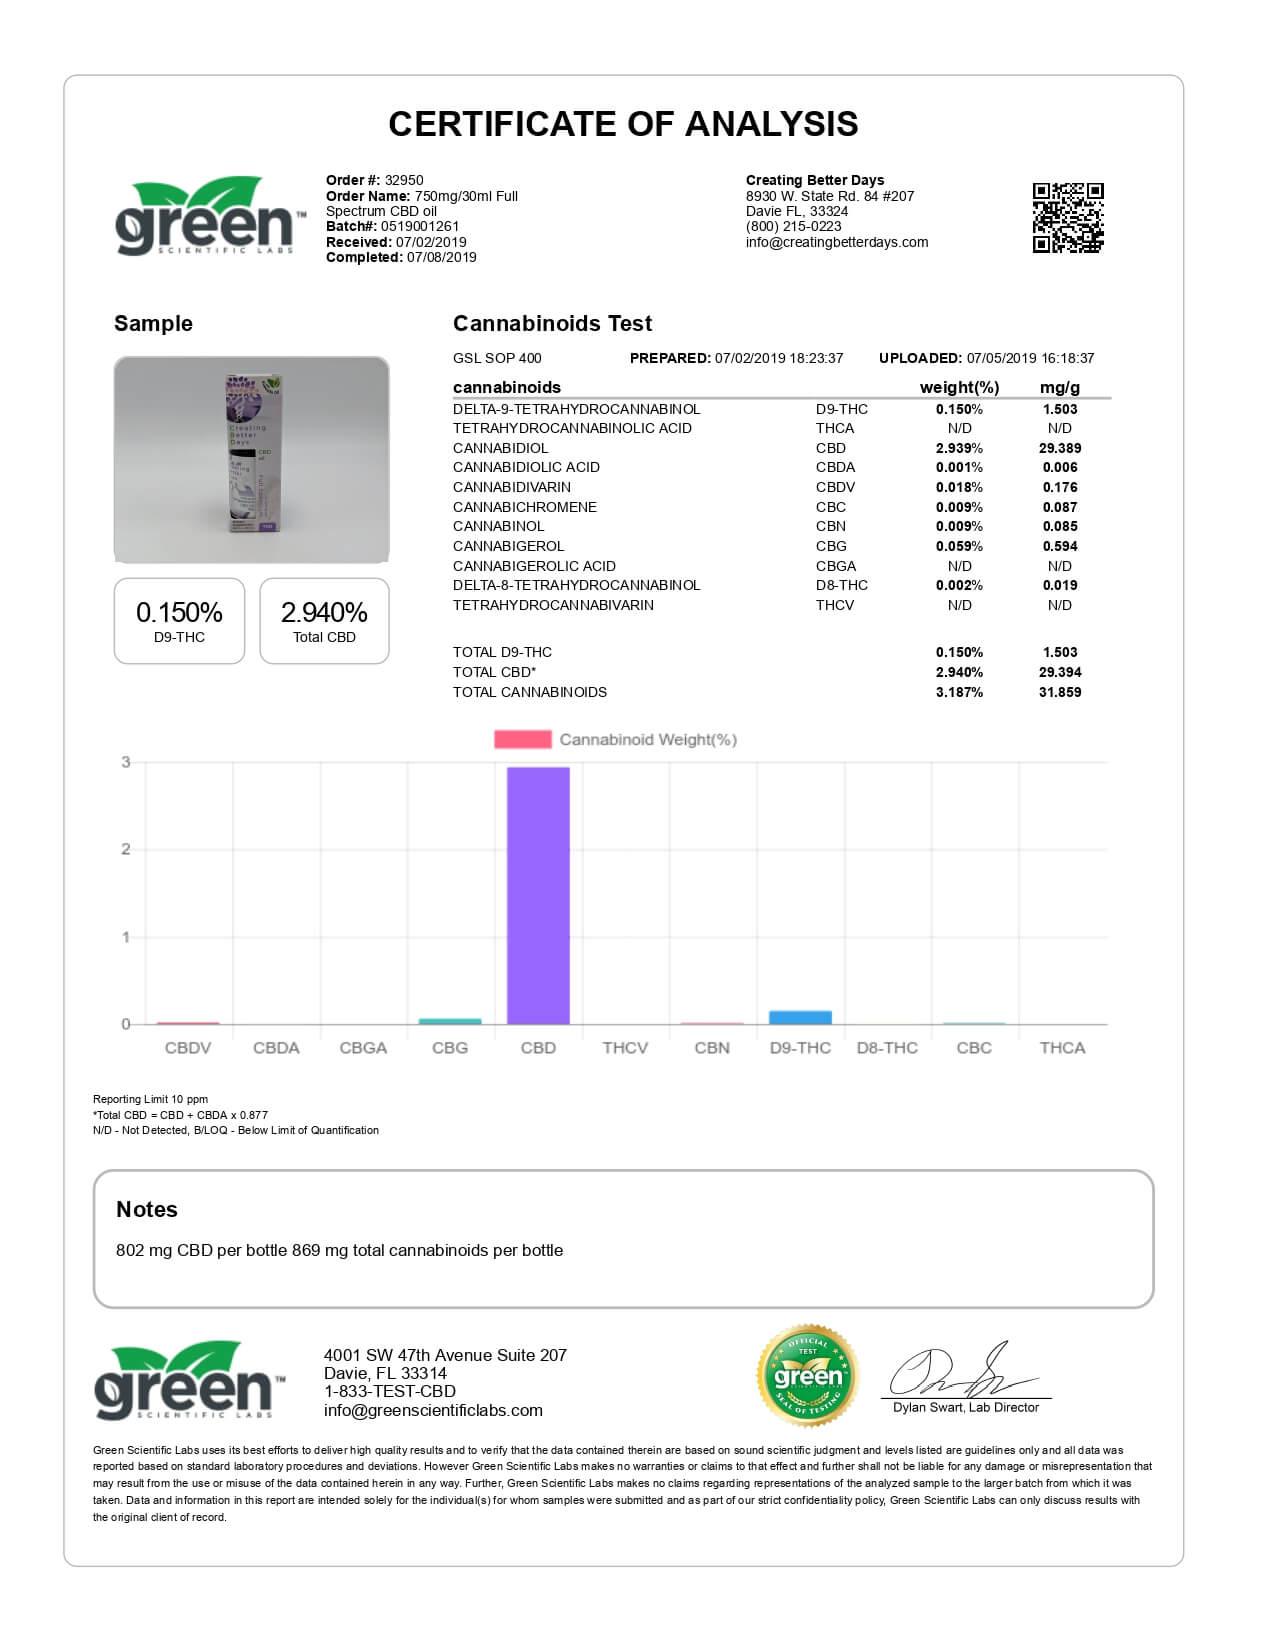 Creating Better Days CBD Tincture Full Spectrum Oil 750mg Lab Report